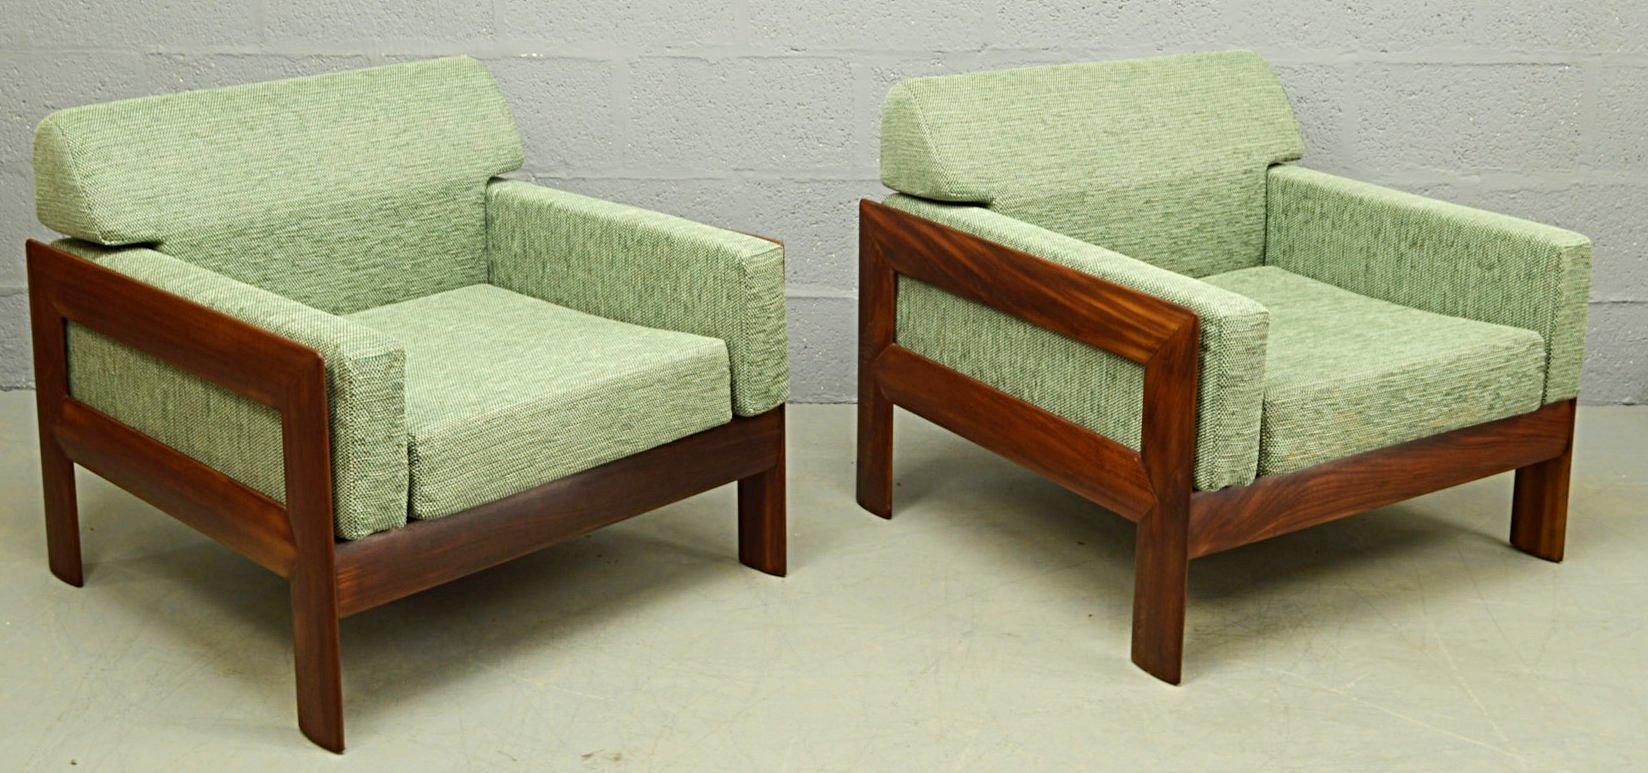 Mid century danish teak three piece living room suite for for Living room suites for sale